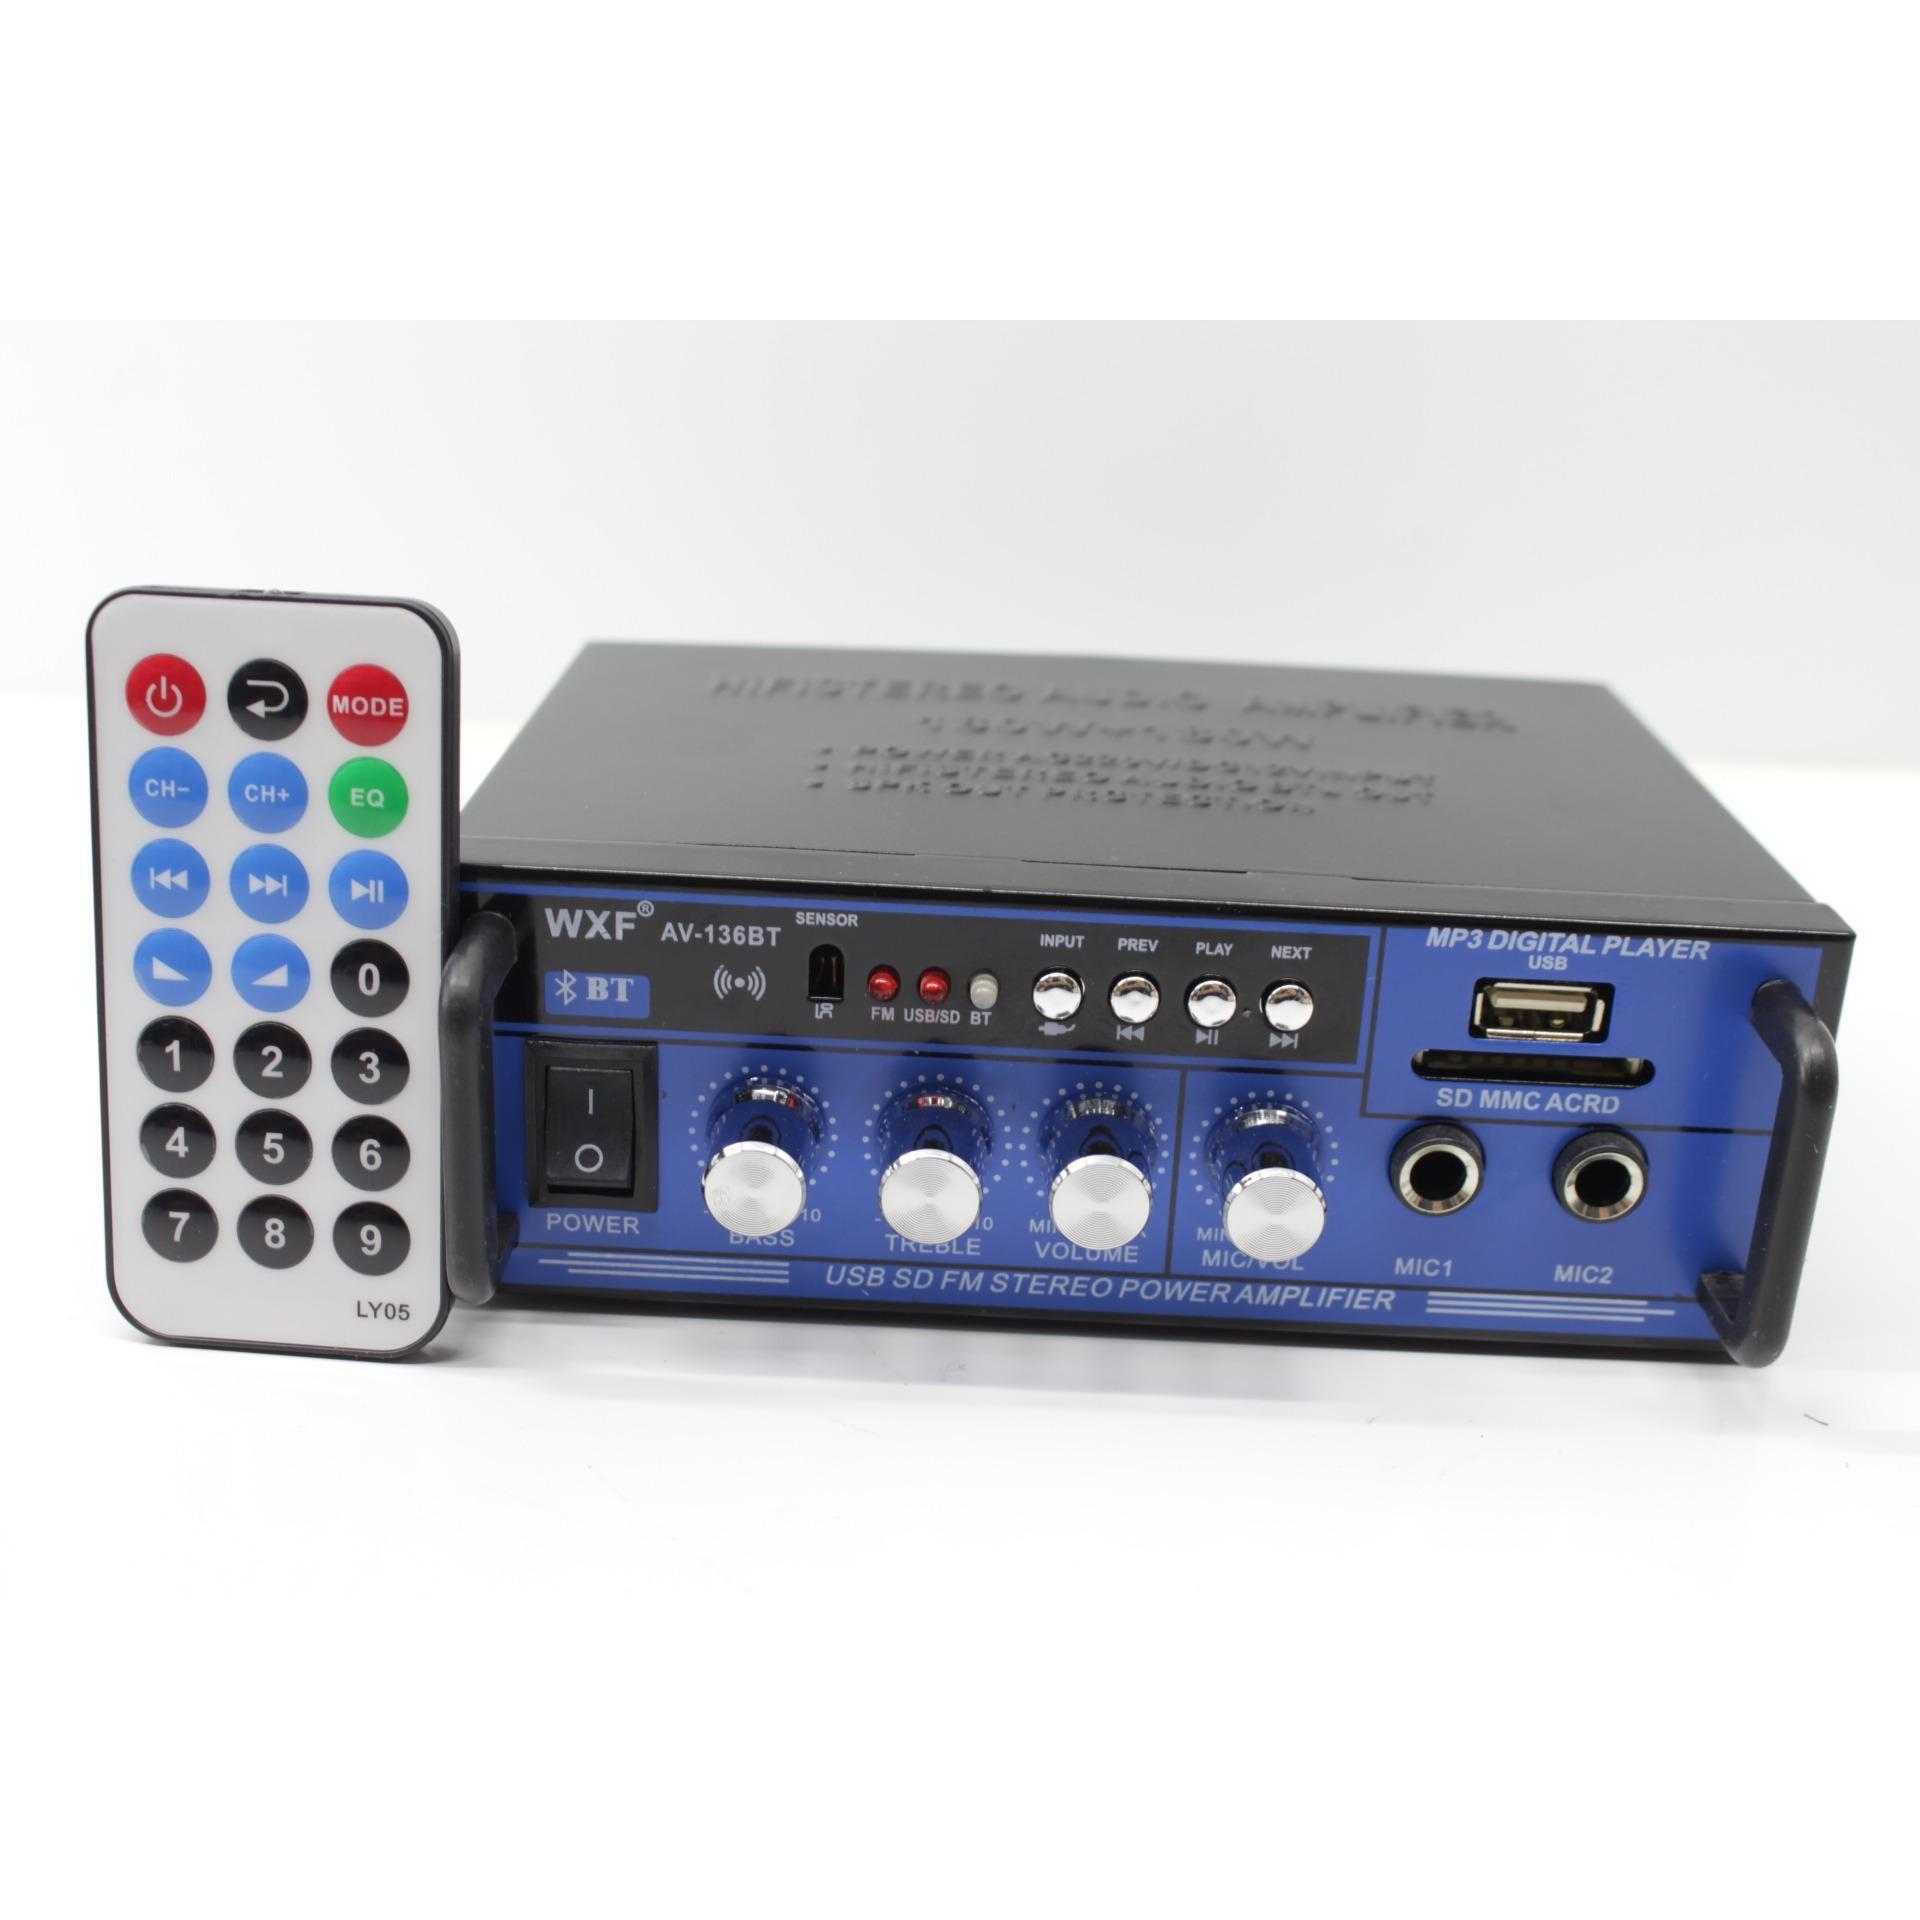 Giá Bán Ampli Wxf Av 136Bt 12V 220V Audio Bluetooth 180W 180W Đen Nguyên None